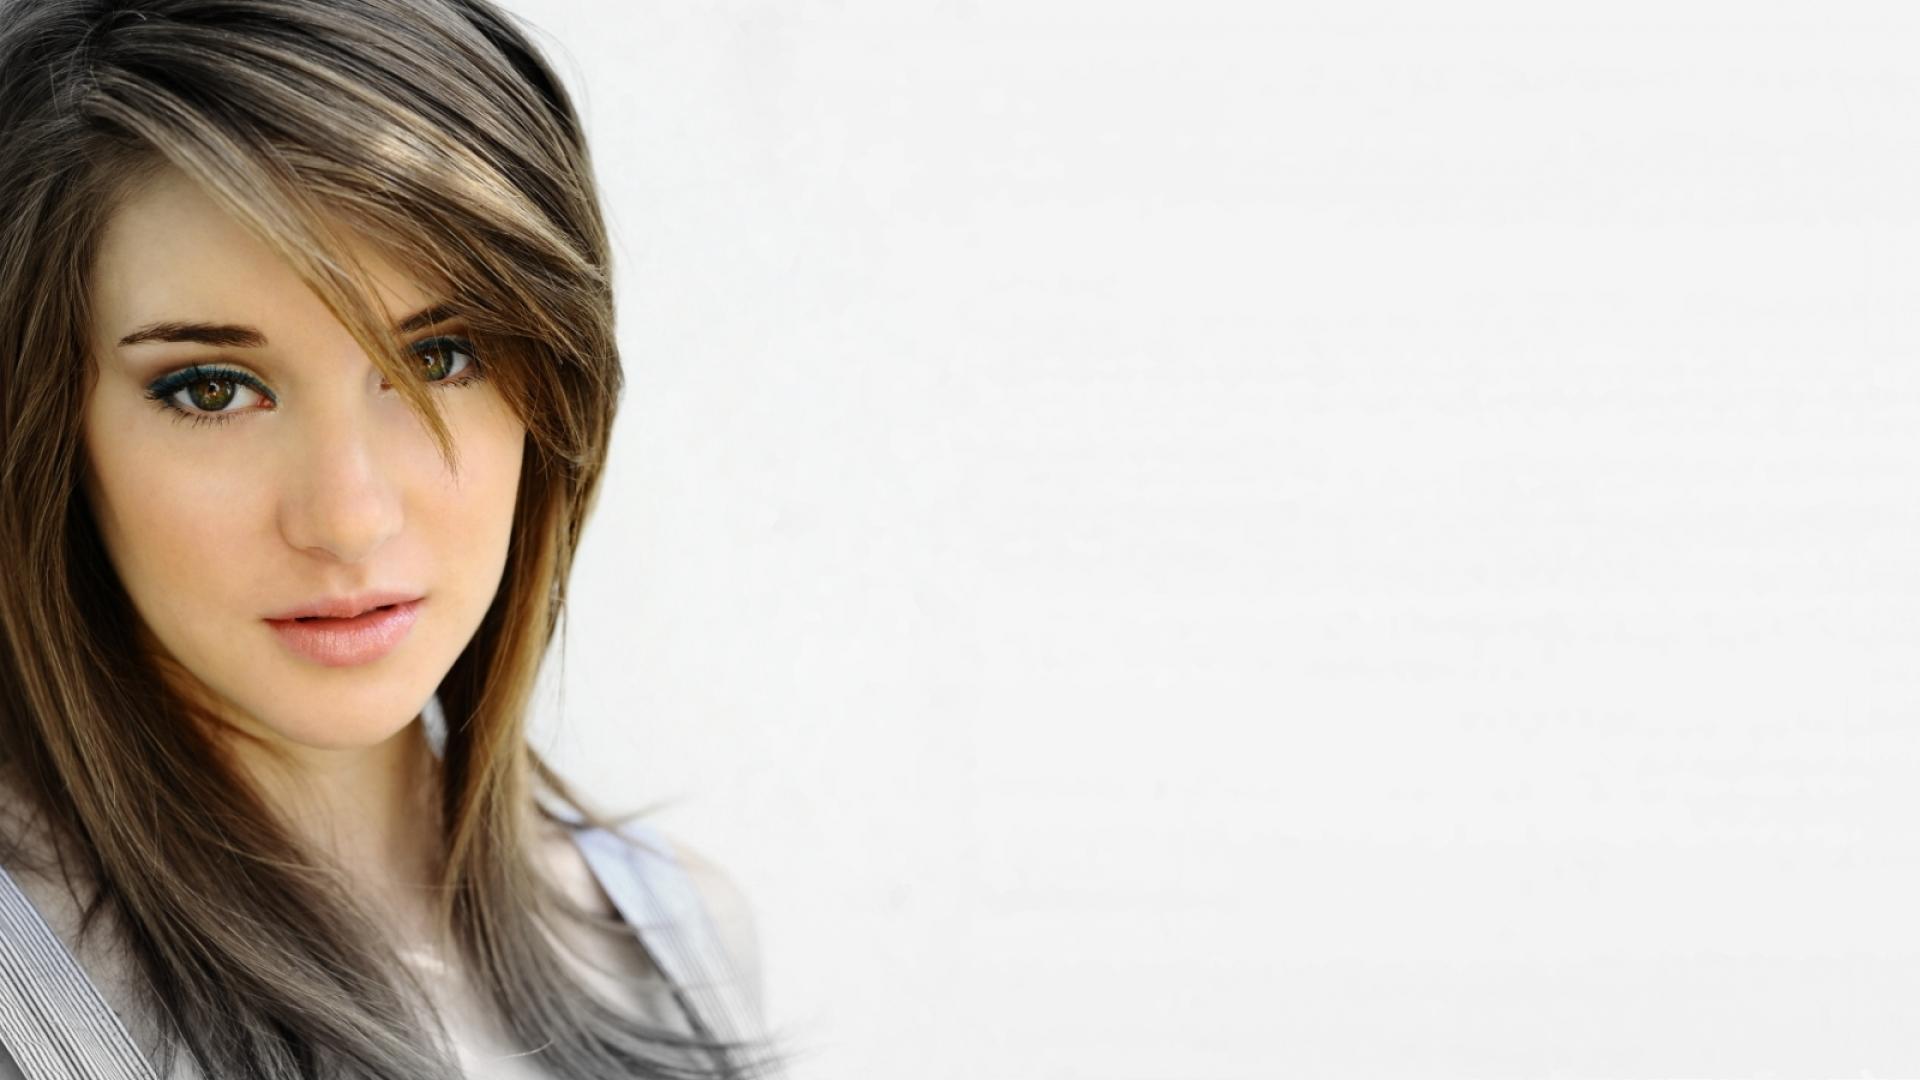 Shailene woodley american celebrity